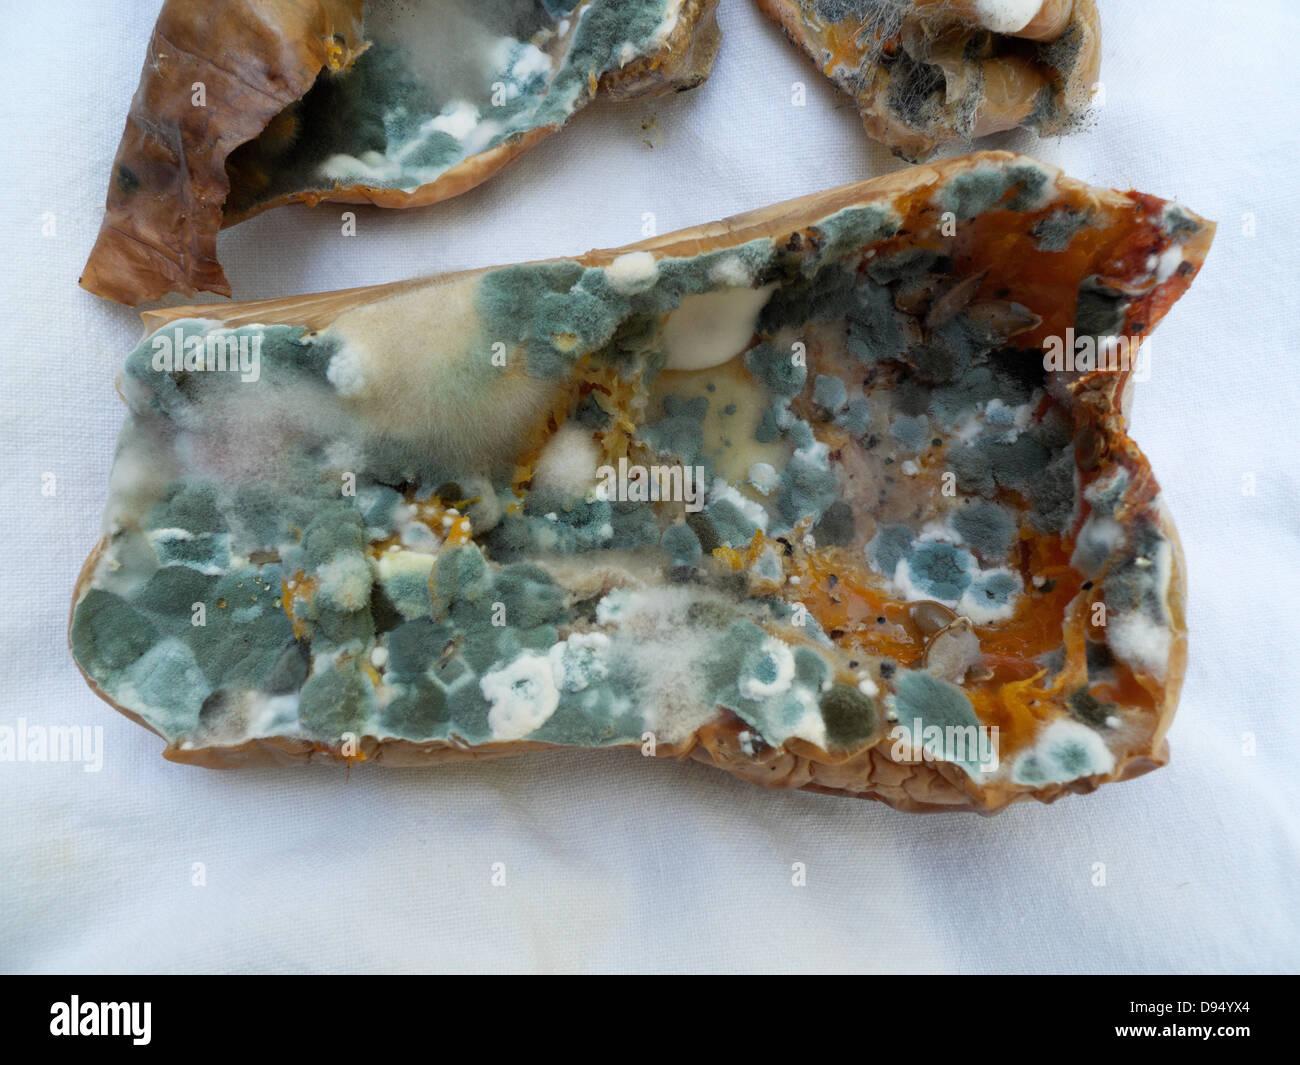 Penicillium On Bread 69400 | BURSARY